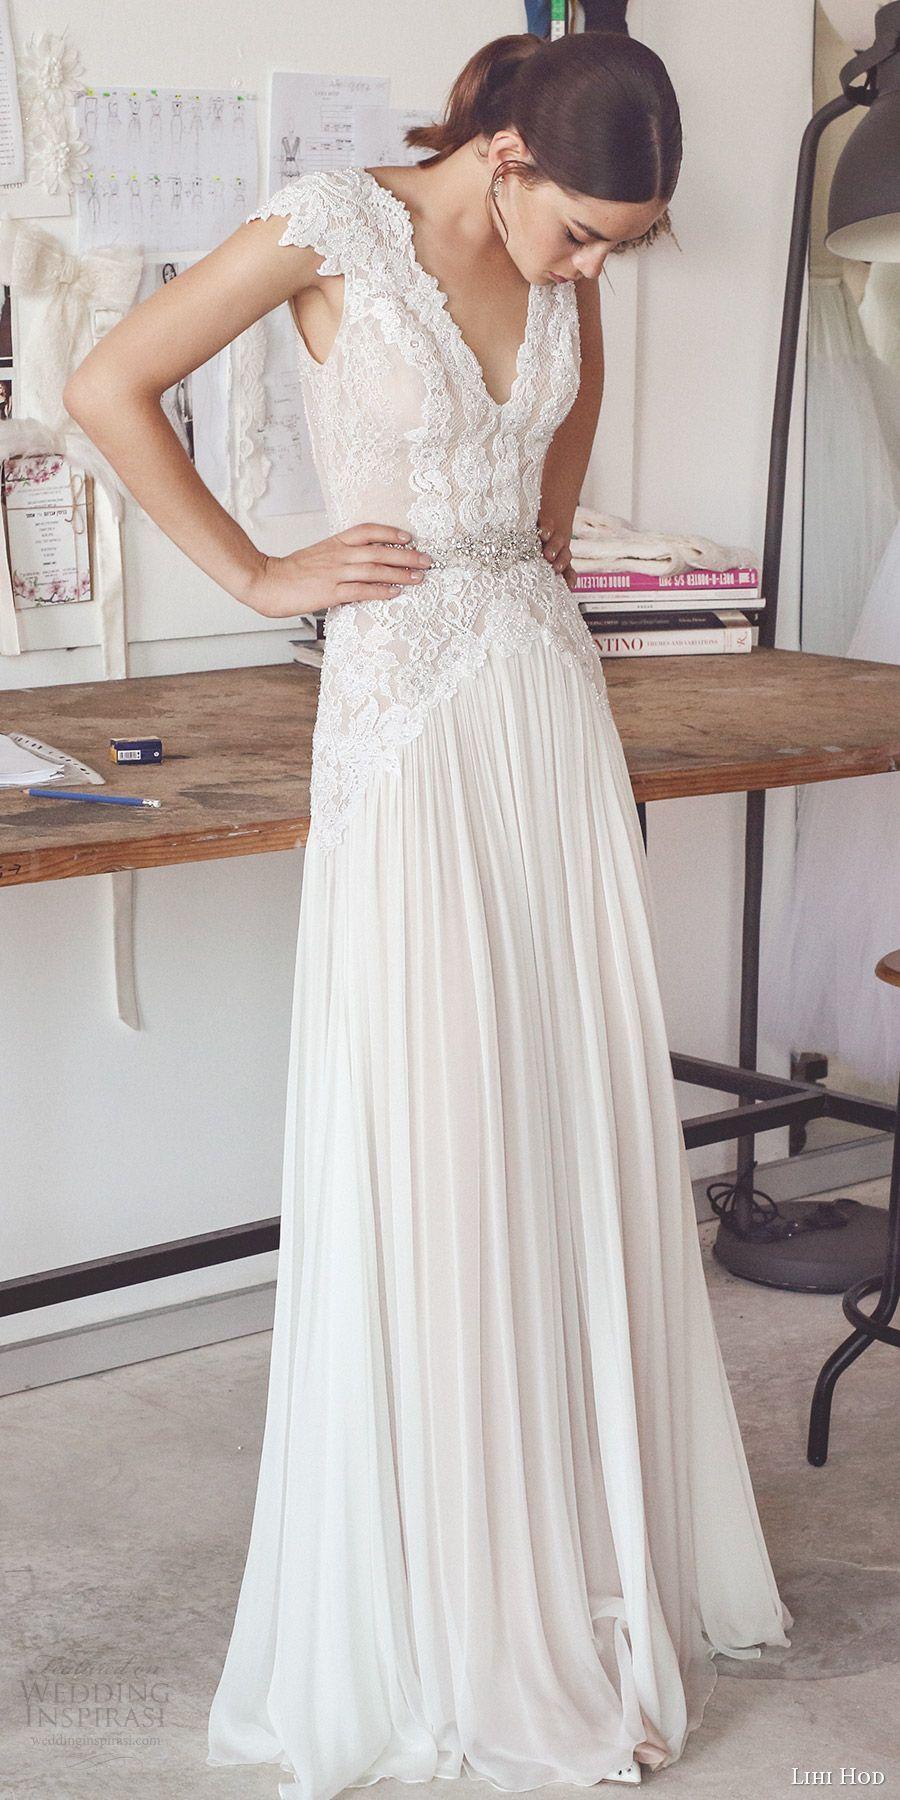 Lihi hod bridal cap sleeves v neck heavily embellished bodice